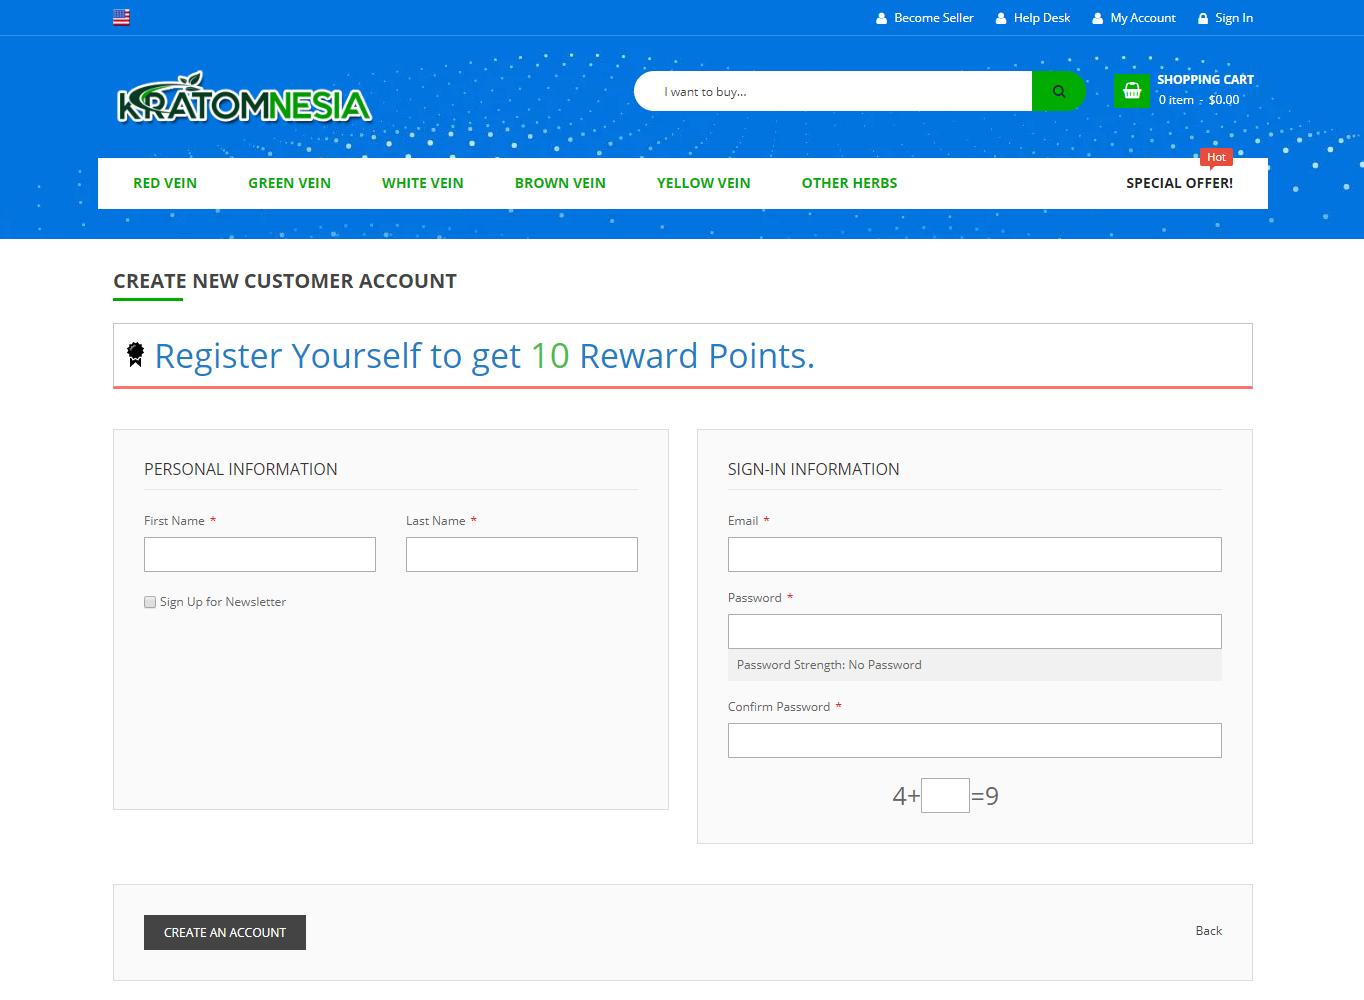 kratomnesia-reward-points-customer-account-create